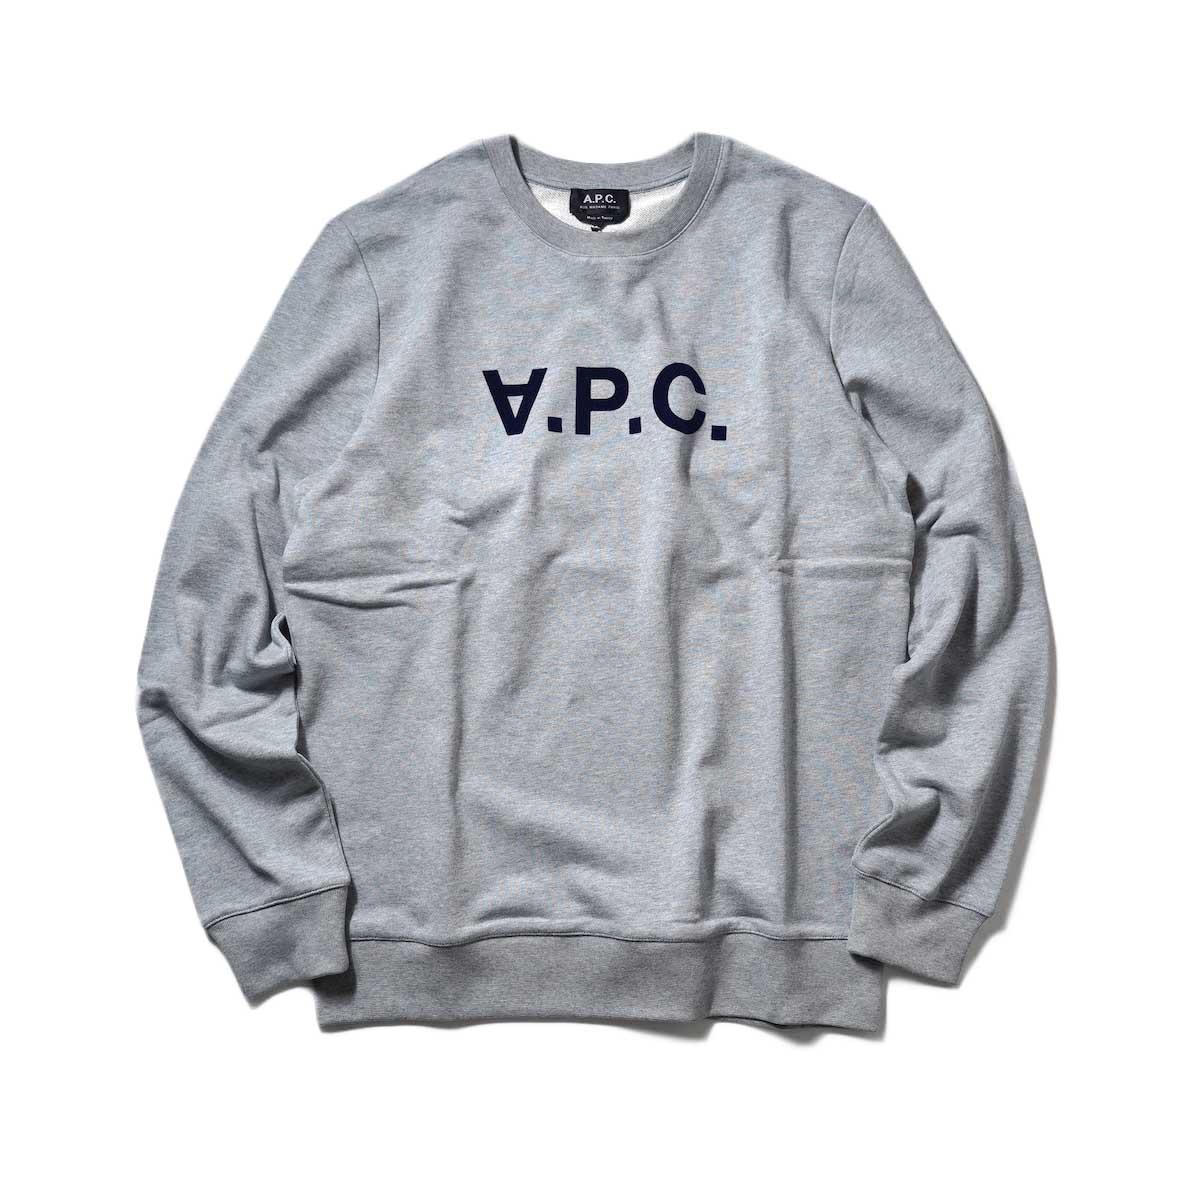 A.P.C. / VPC スウェットシャツ (Gray)